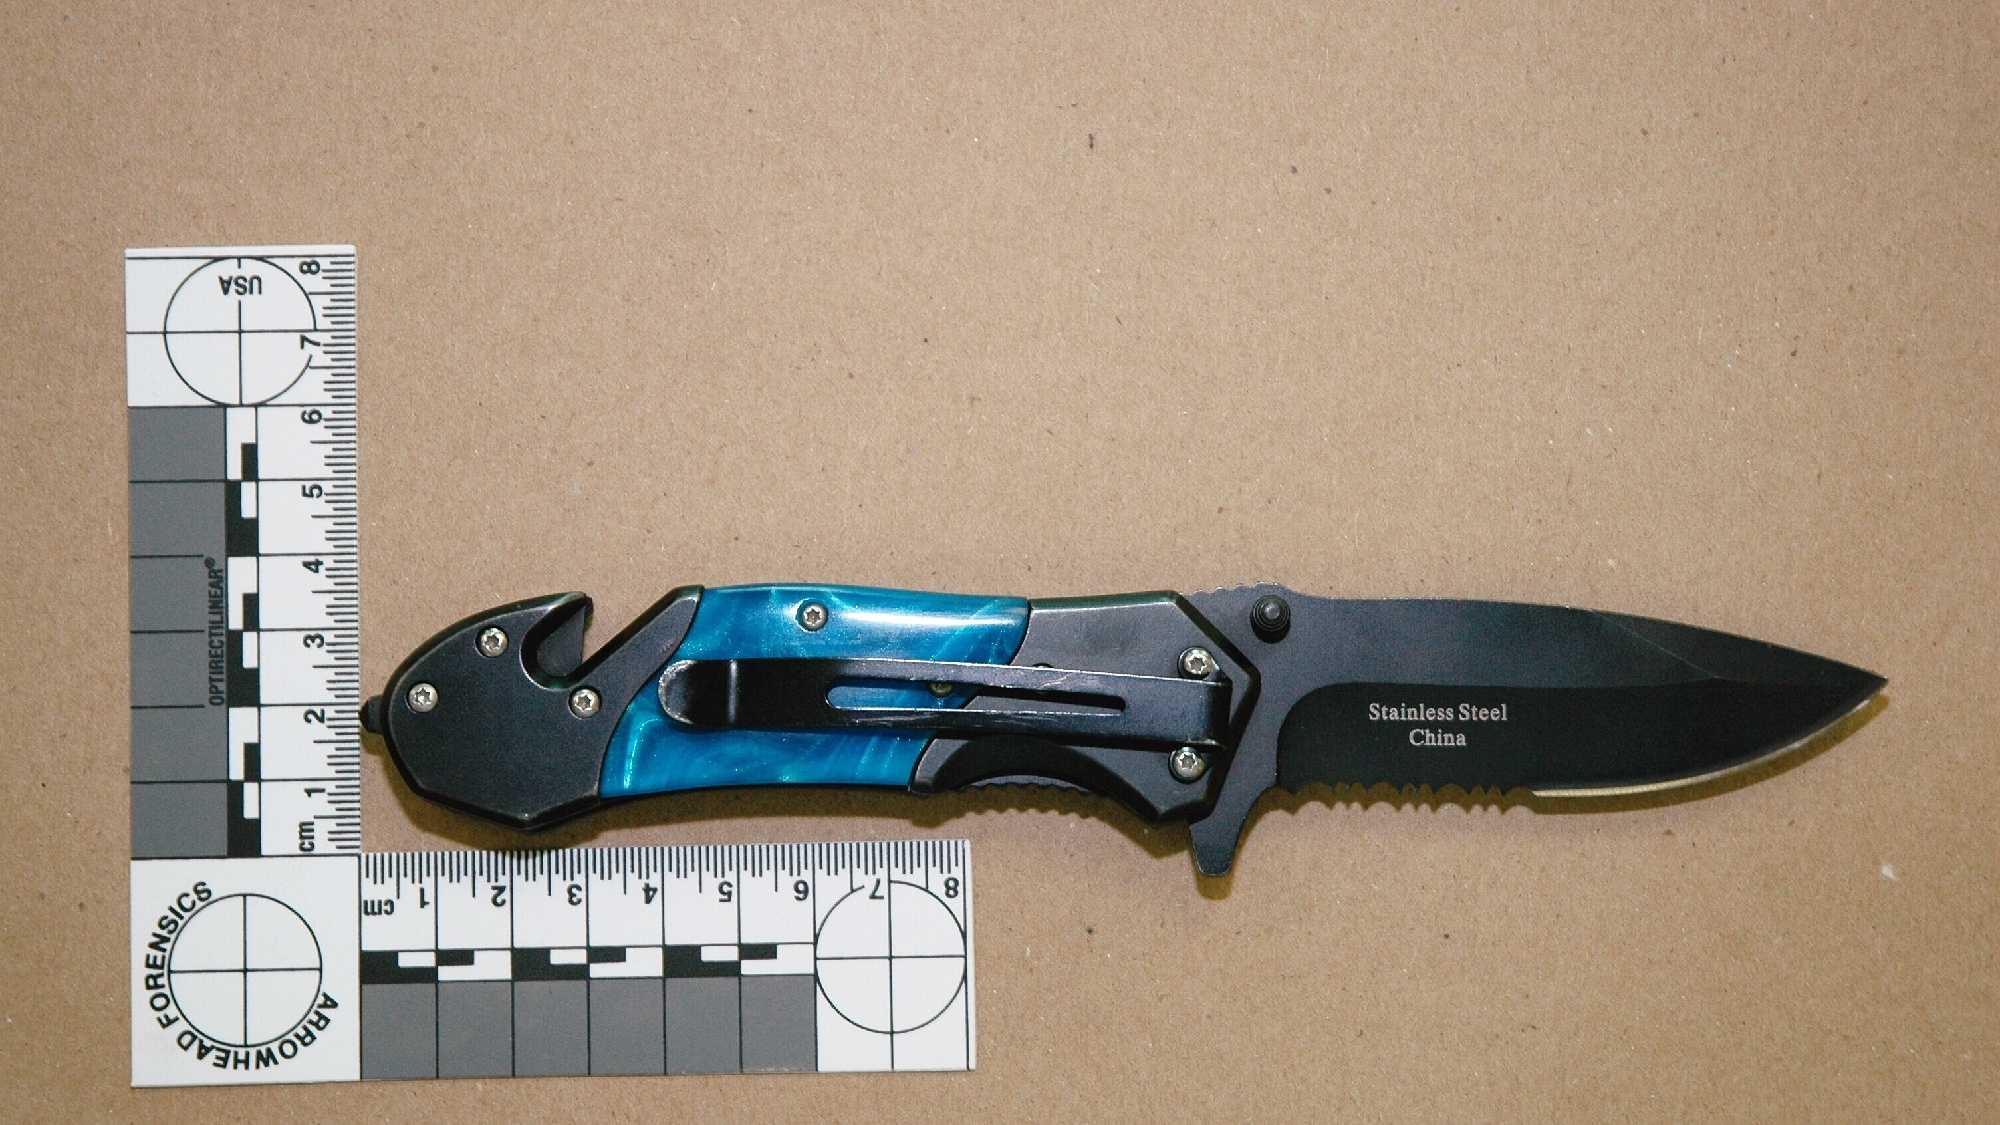 Freddie Gray's knife